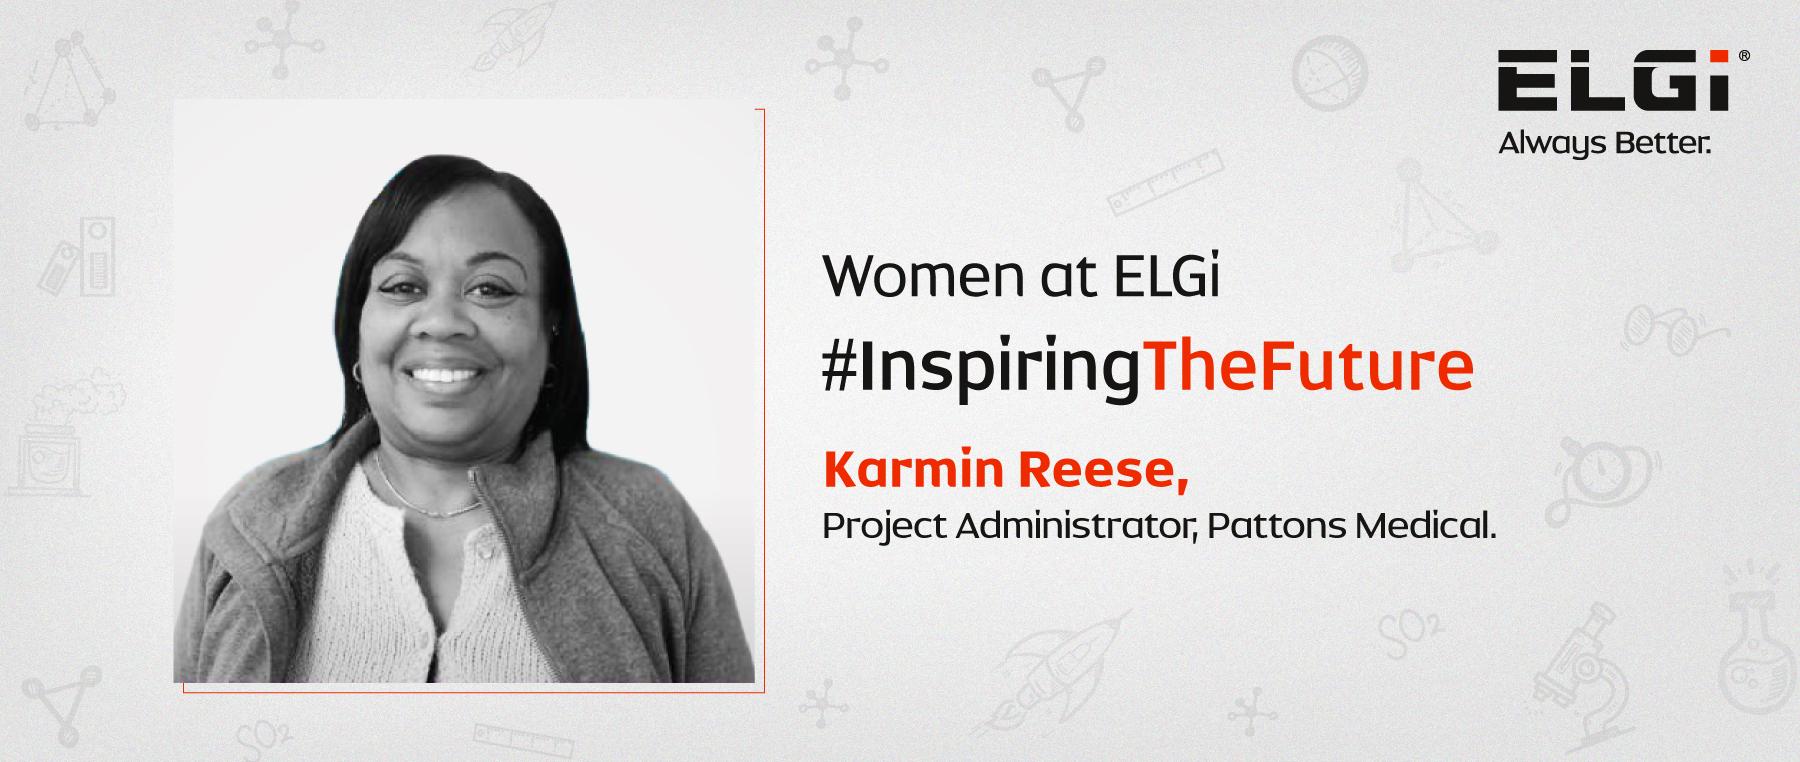 Women at ELGi #InspiringTheFuture – Karmin Reese